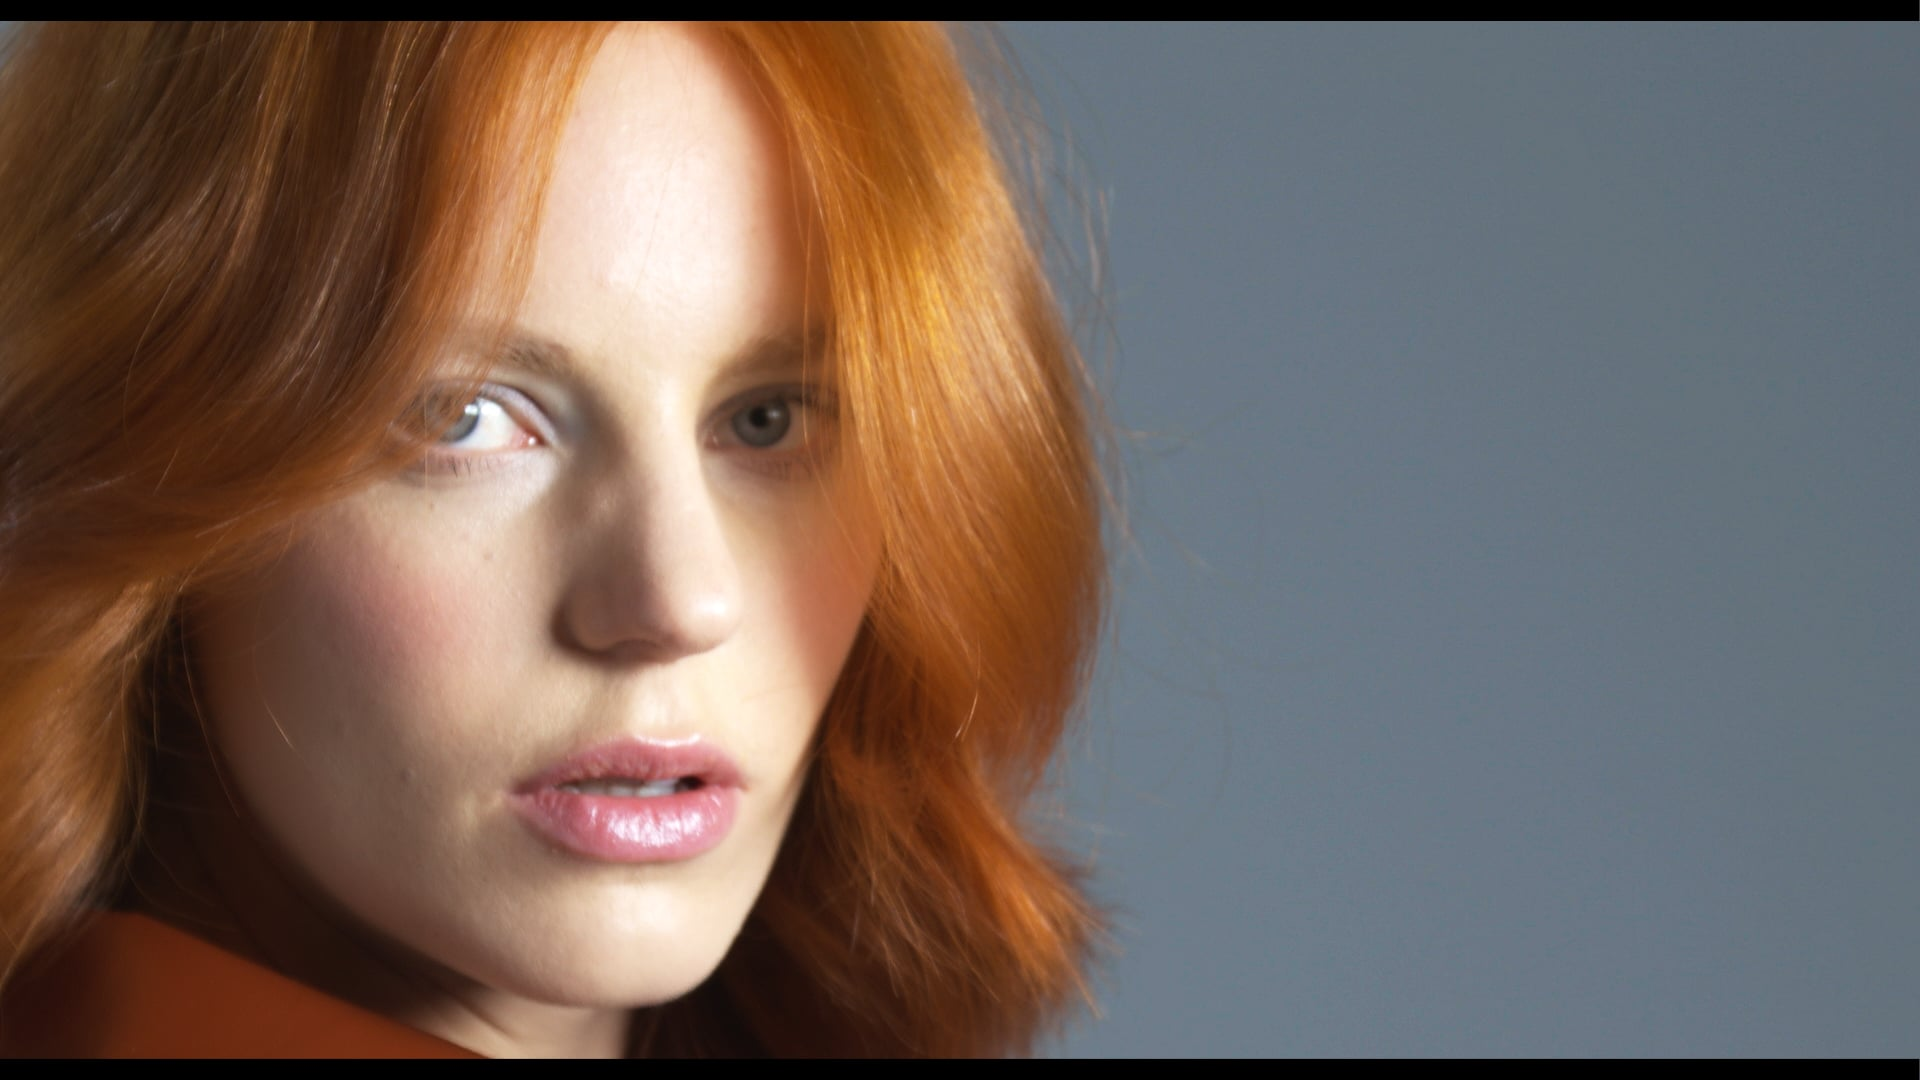 L'OREAL X CREATIVE HEAD 'Colour'